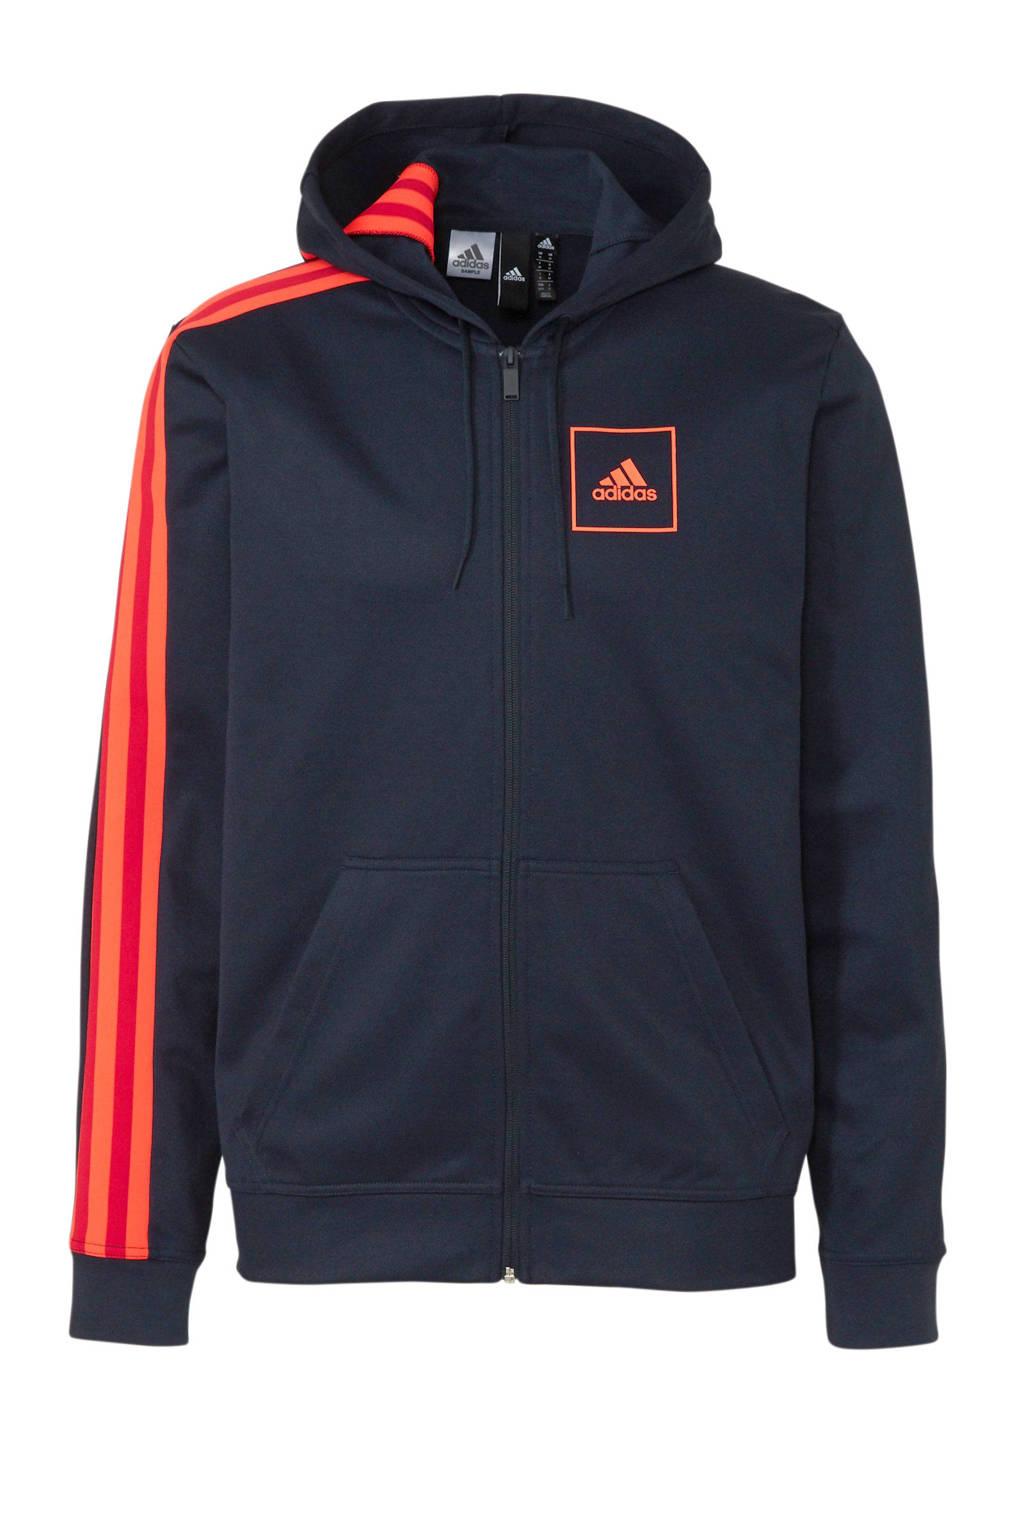 adidas   sportvest donkerblauw/rood/oranje, Donkerblauw/rood/oranje